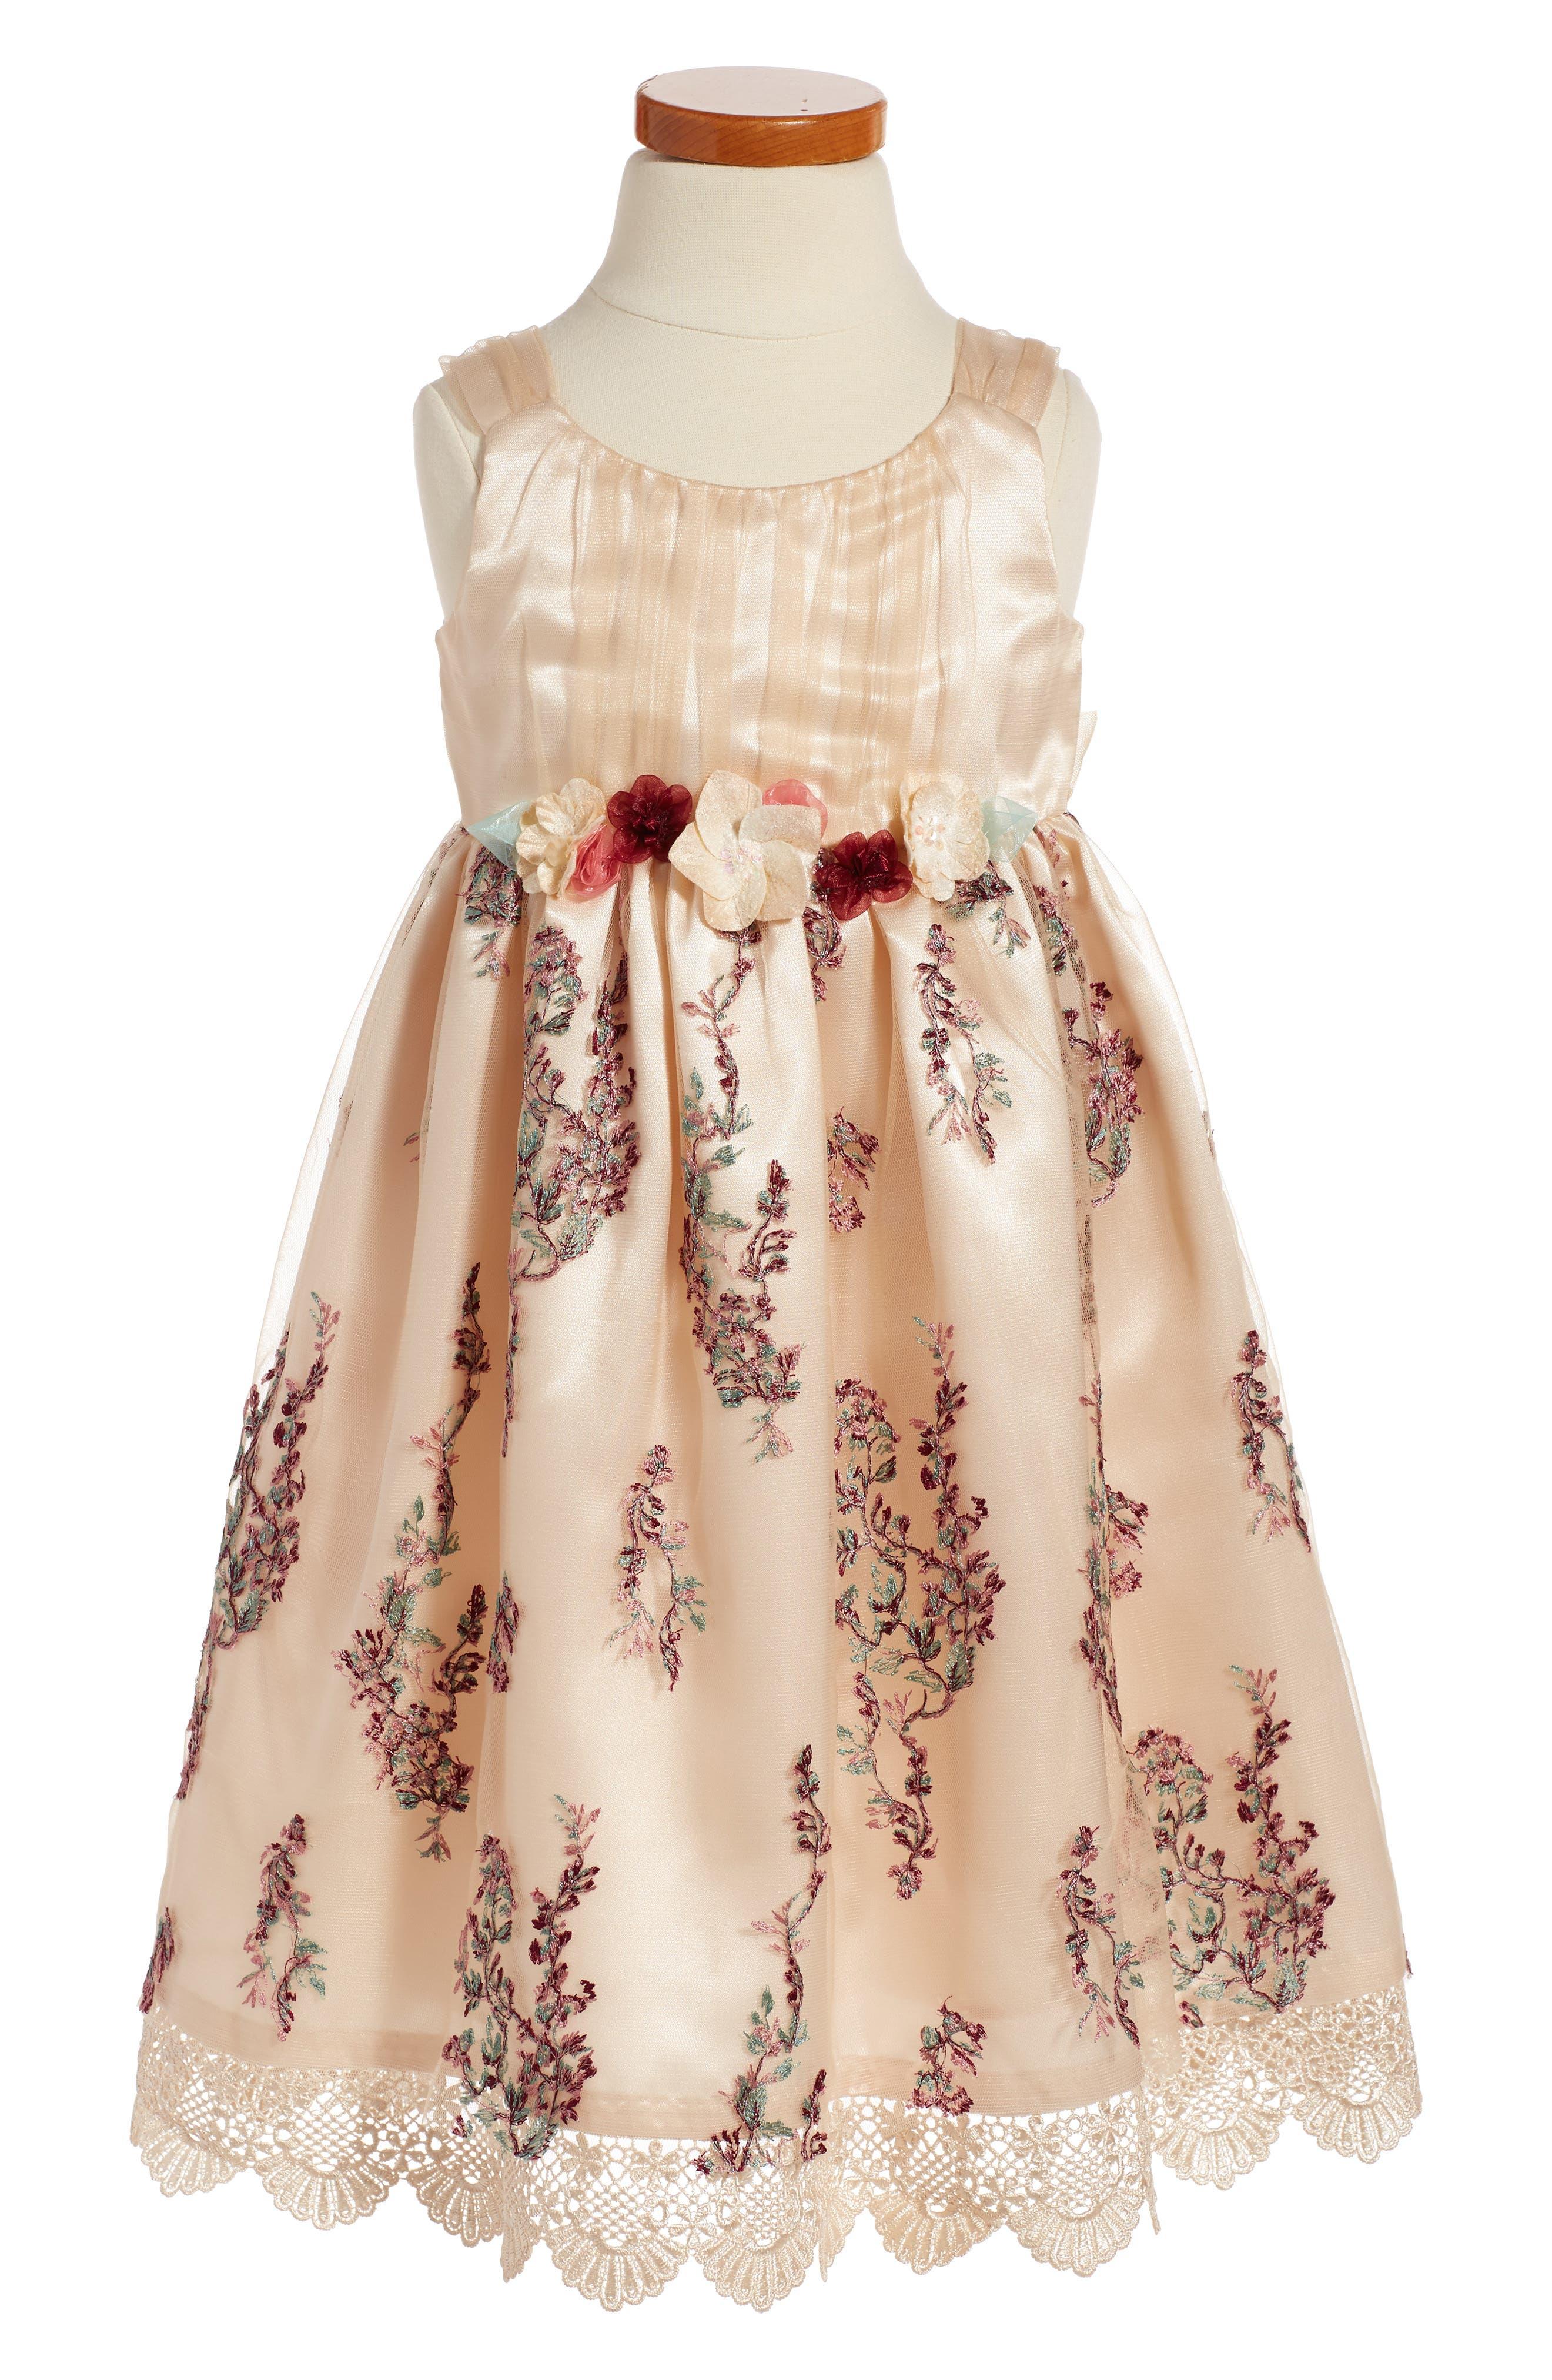 Iris & Ivy Embroidered Sleeveless Dress (Toddler Girls & Little Girls)